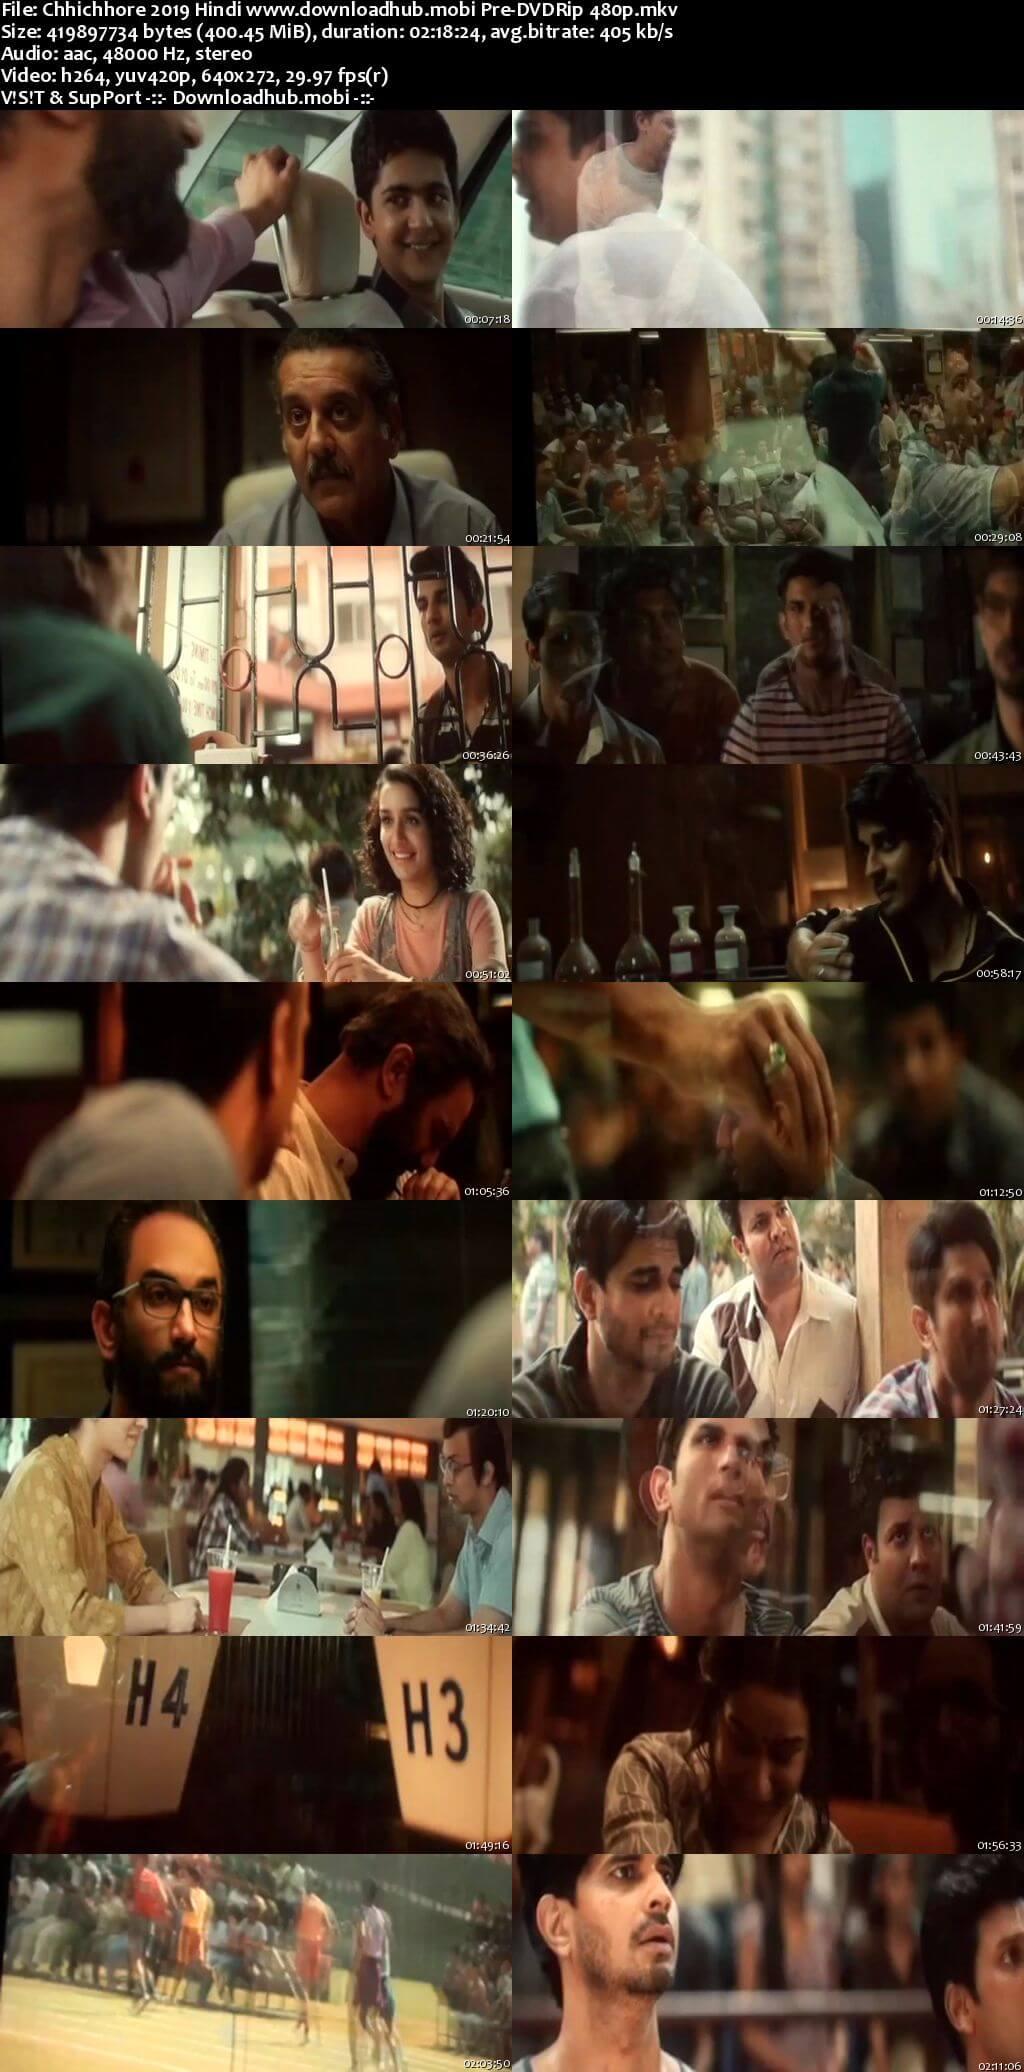 Chhichhore 2019 Hindi 400MB Pre-DVDRip 480p